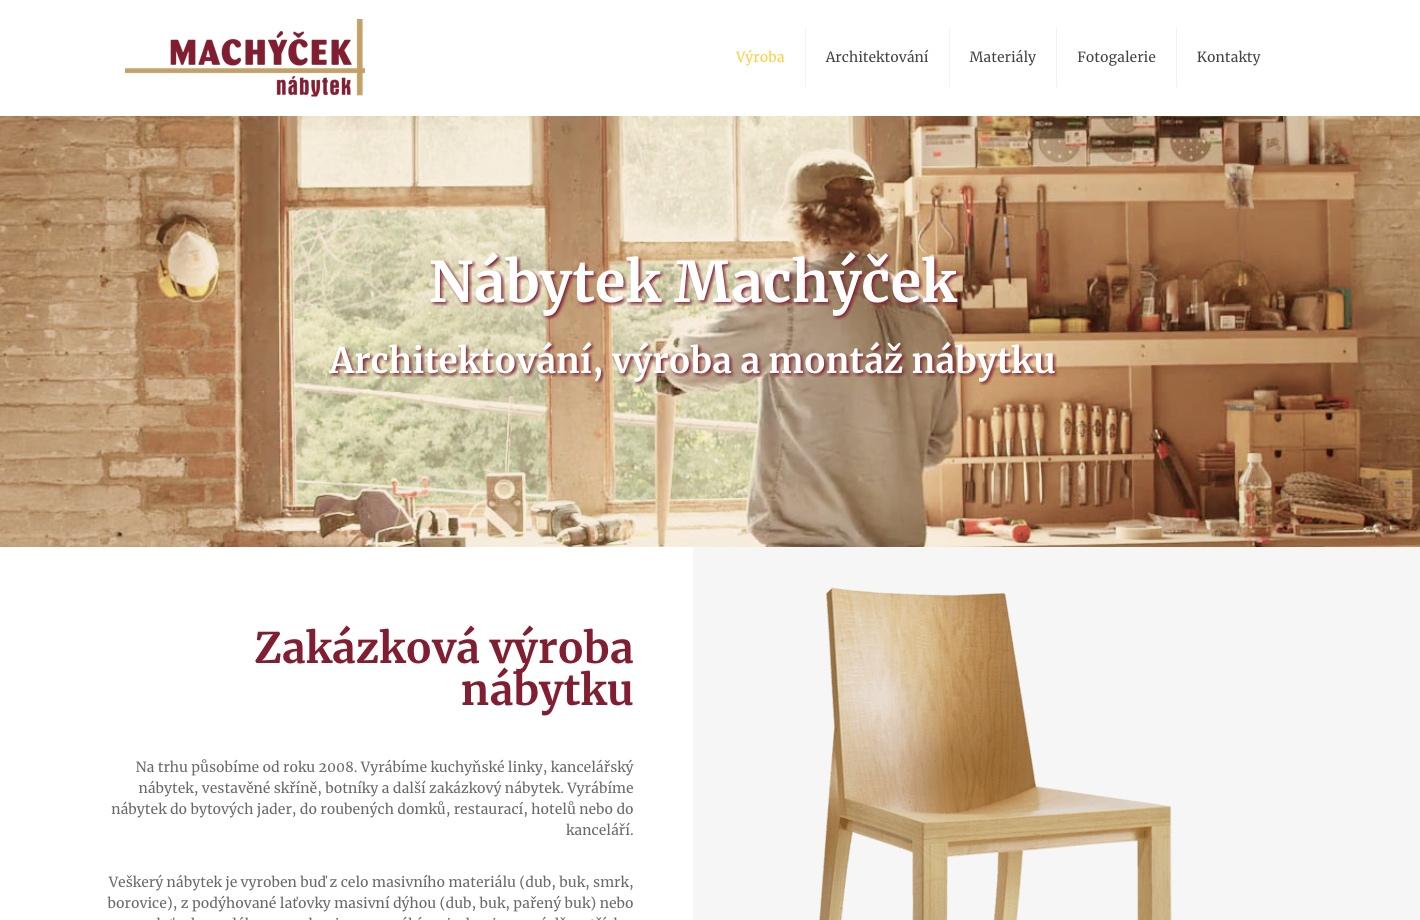 recenze-machycek